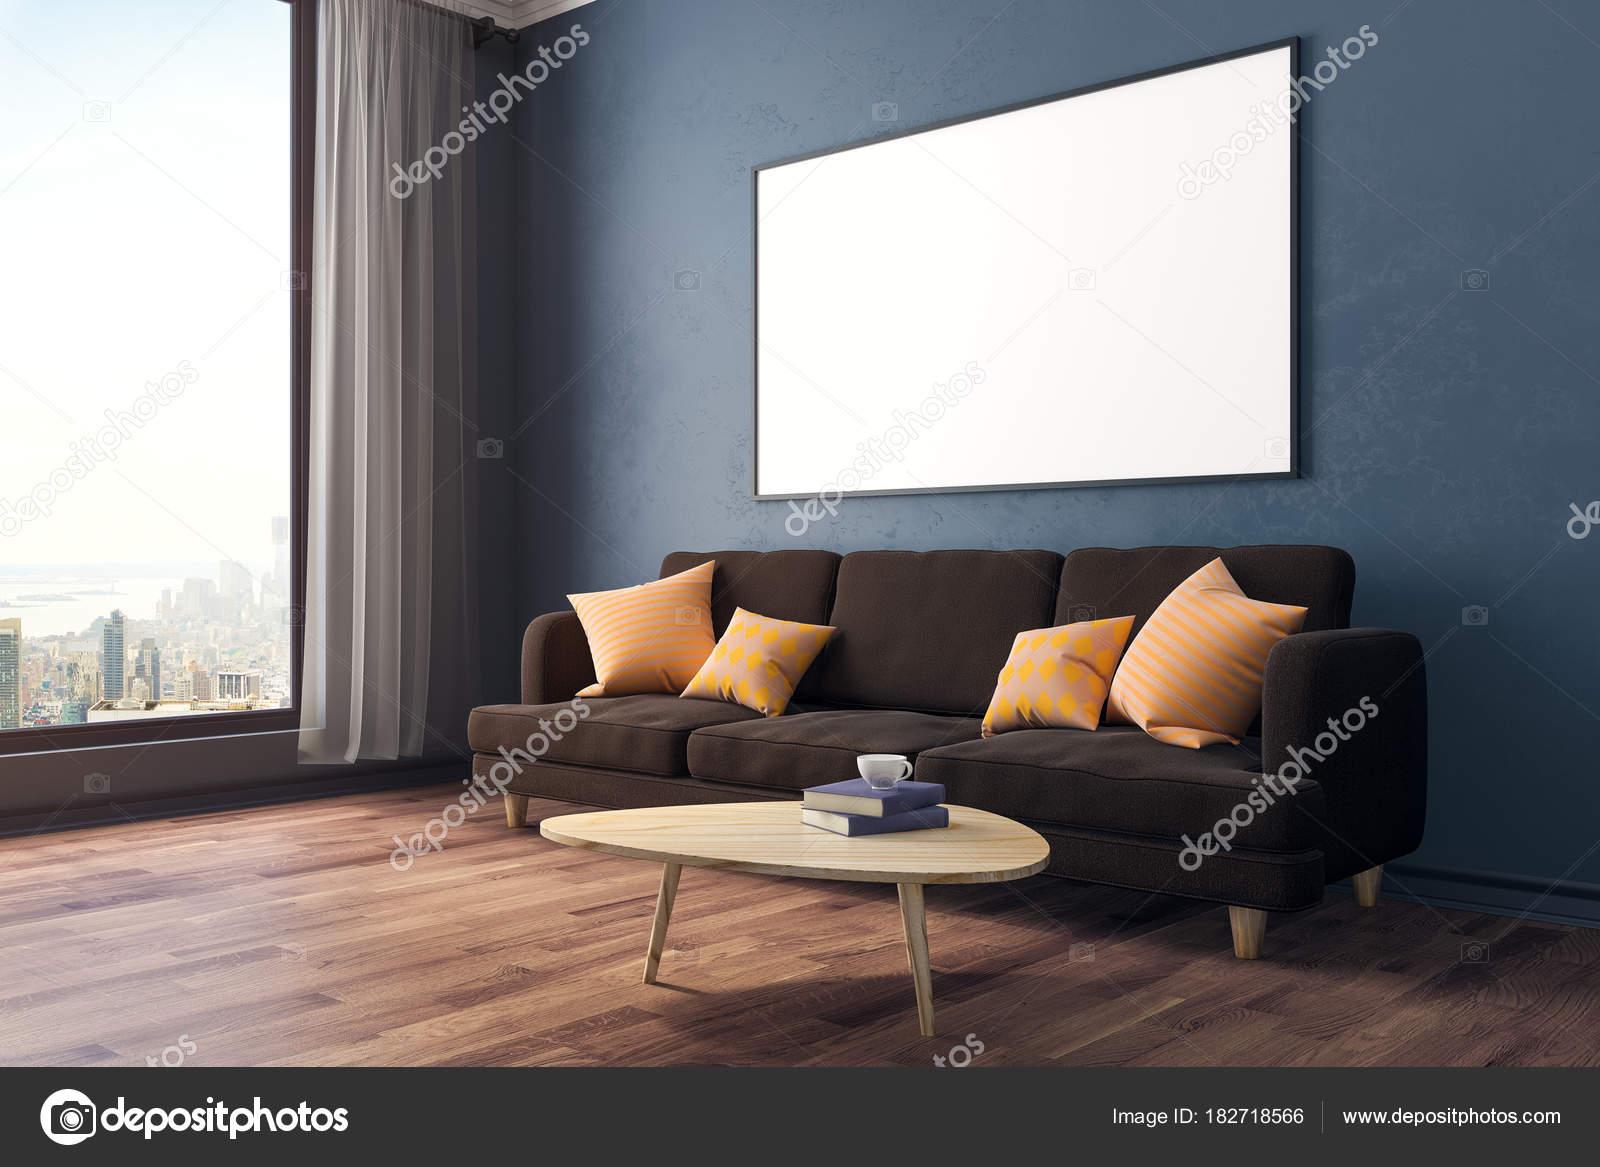 Modernes Zimmer mit Banner-Seite — Stockfoto © peshkova #182718566